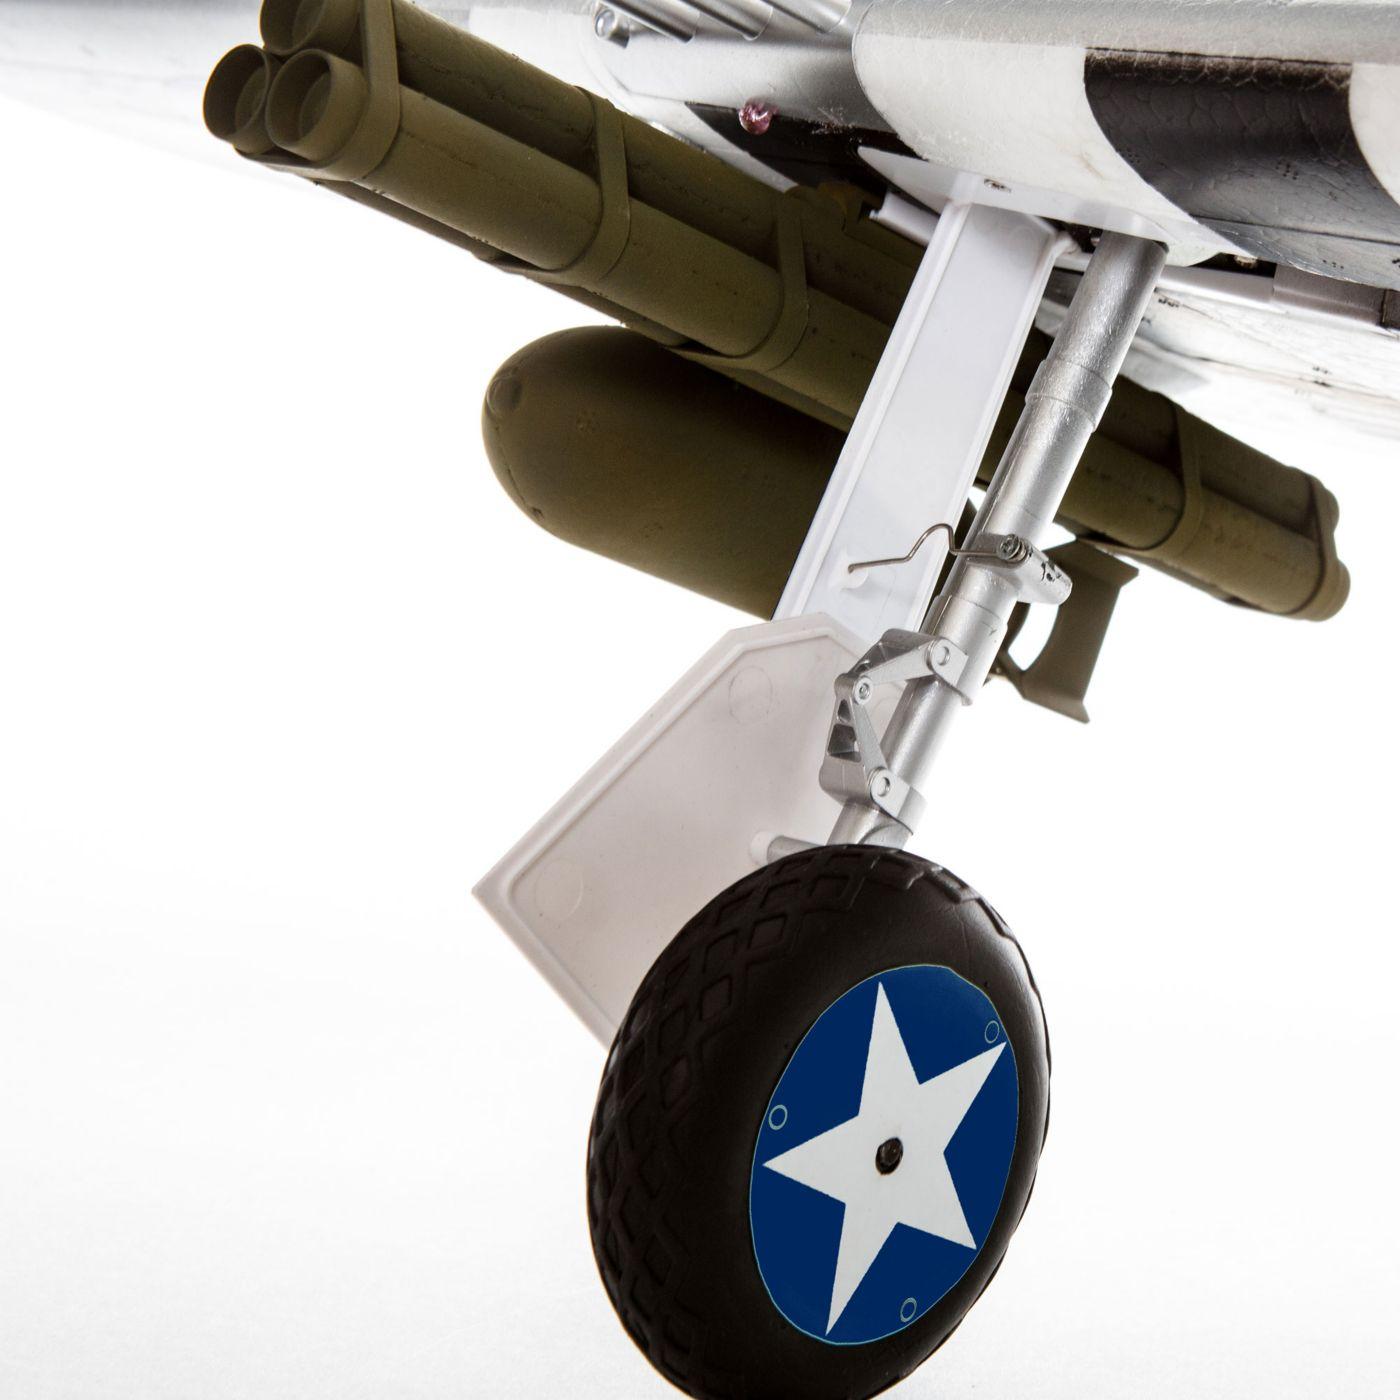 E-flite P-47 Razorback Warbird bnf basic safe 08